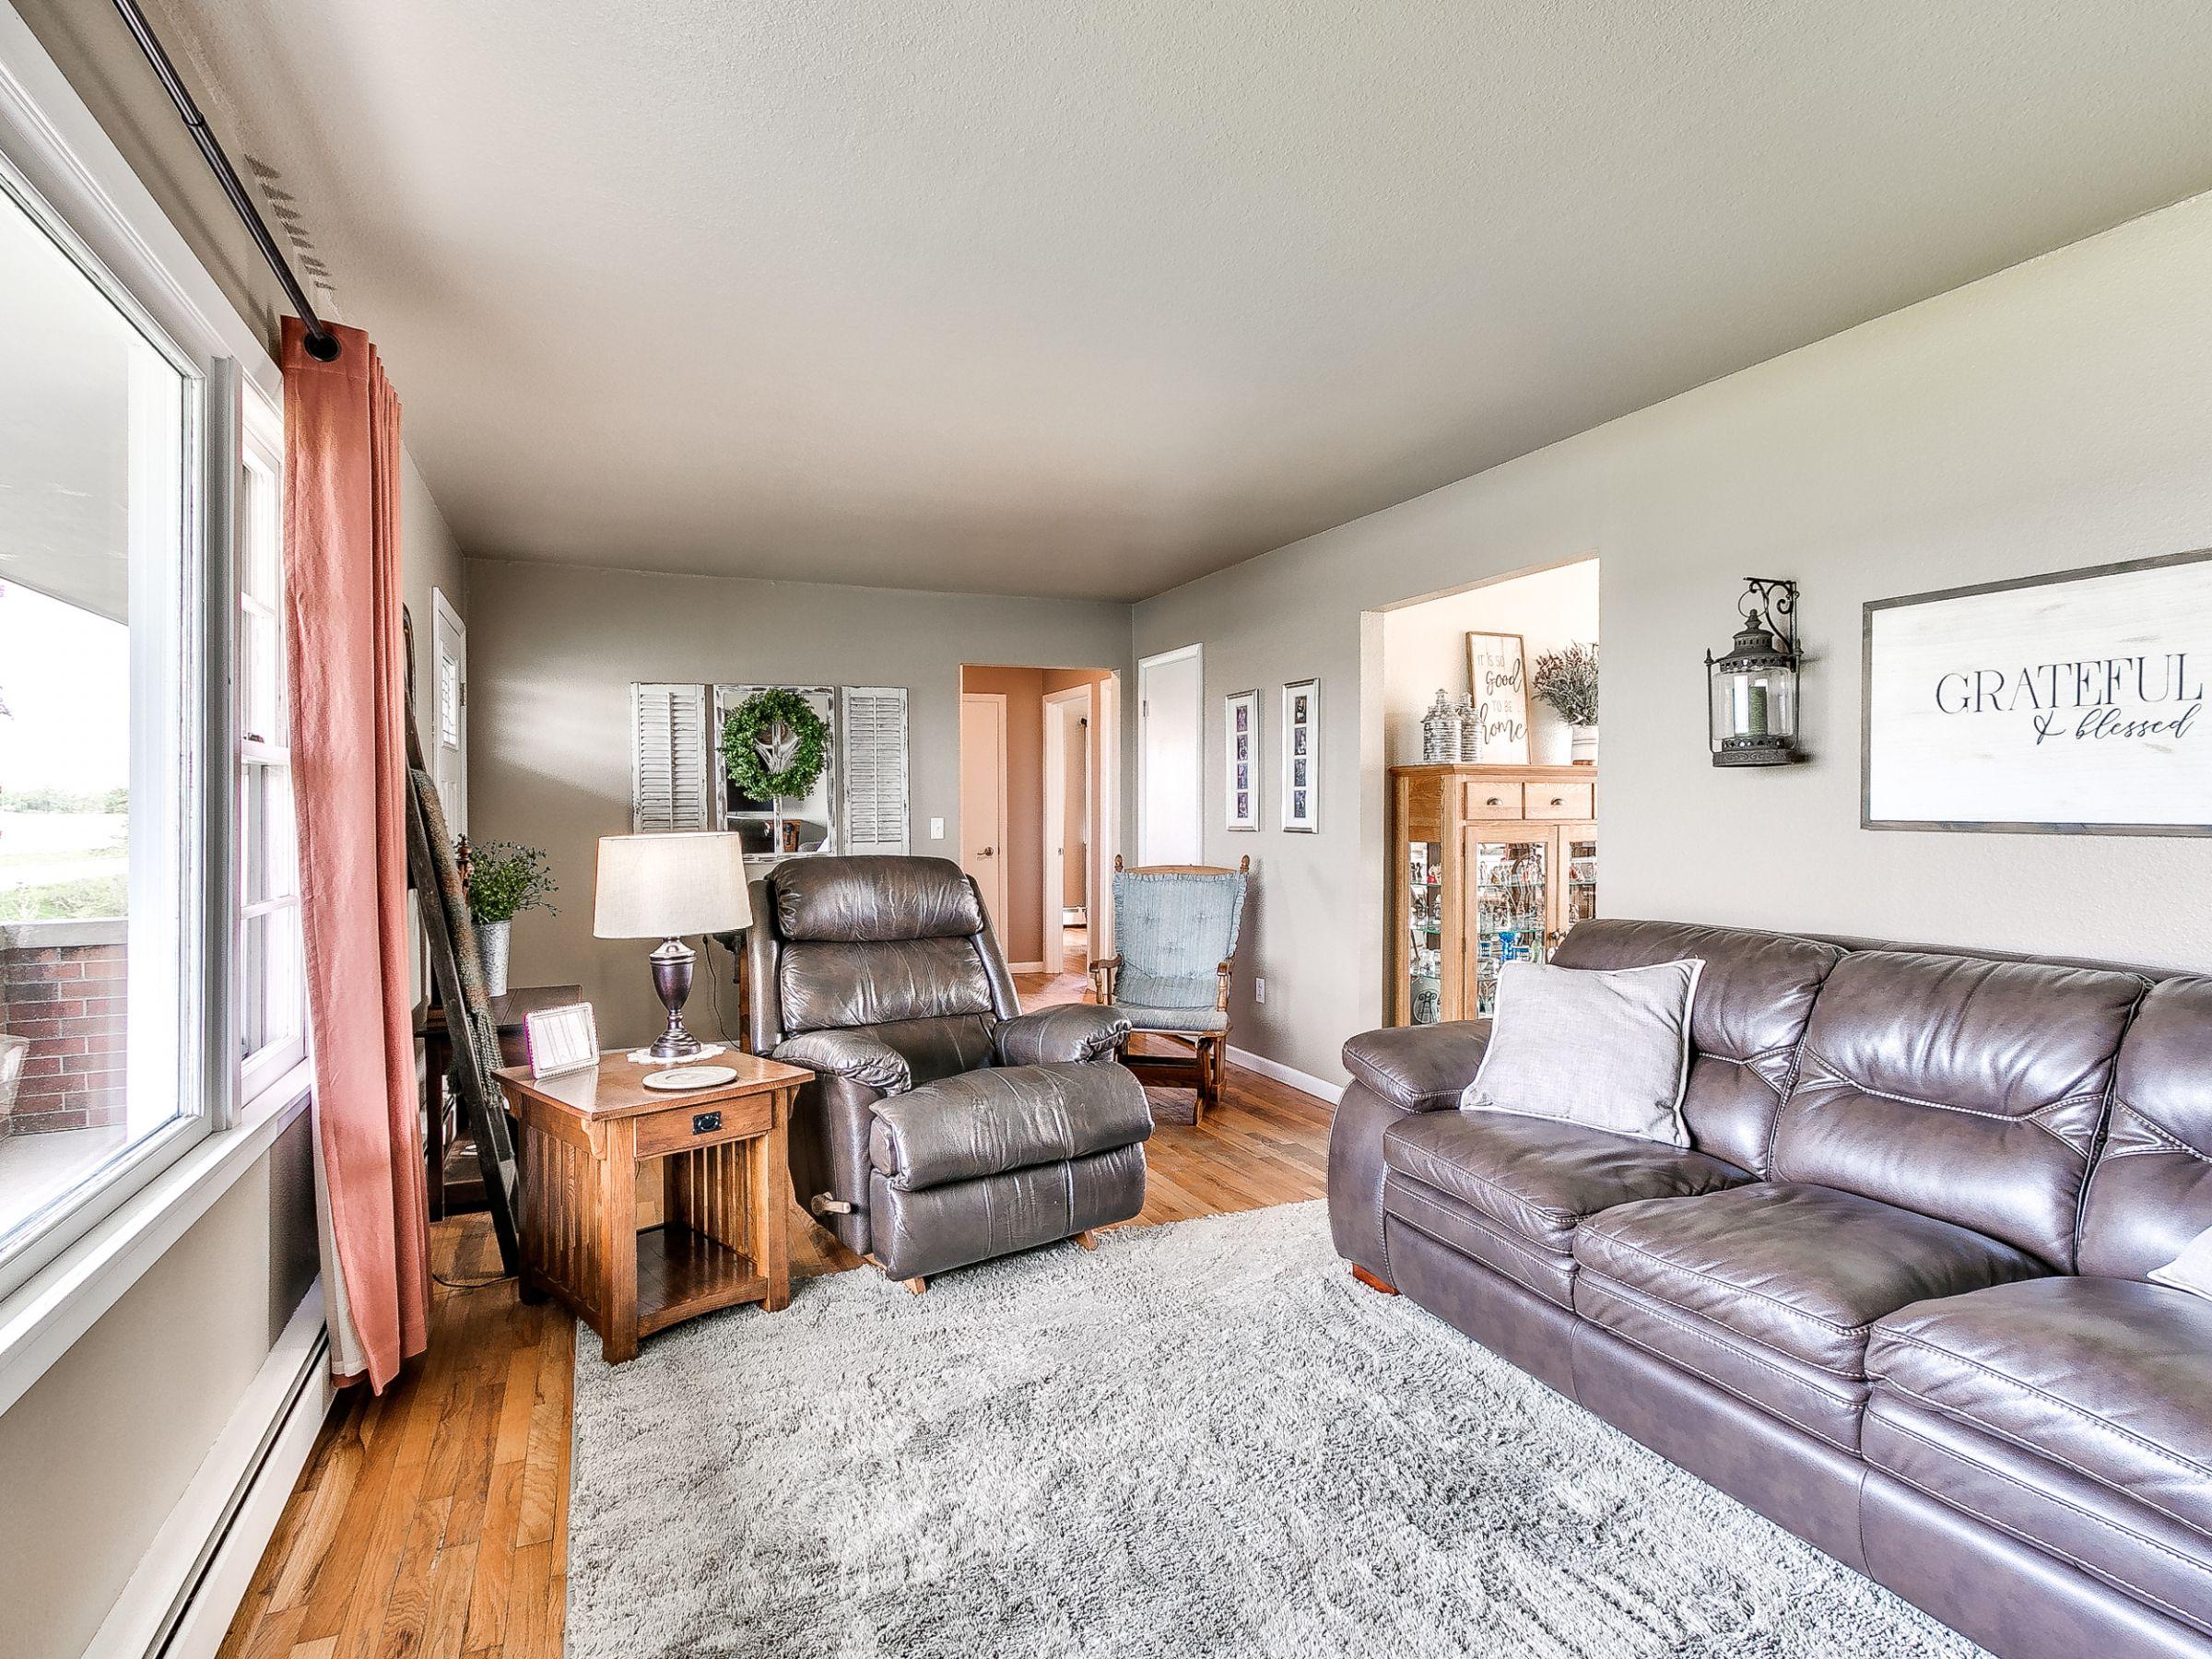 residential-warren-county-iowa-3-acres-listing-number-15516-2-2021-05-12-144930.jpg